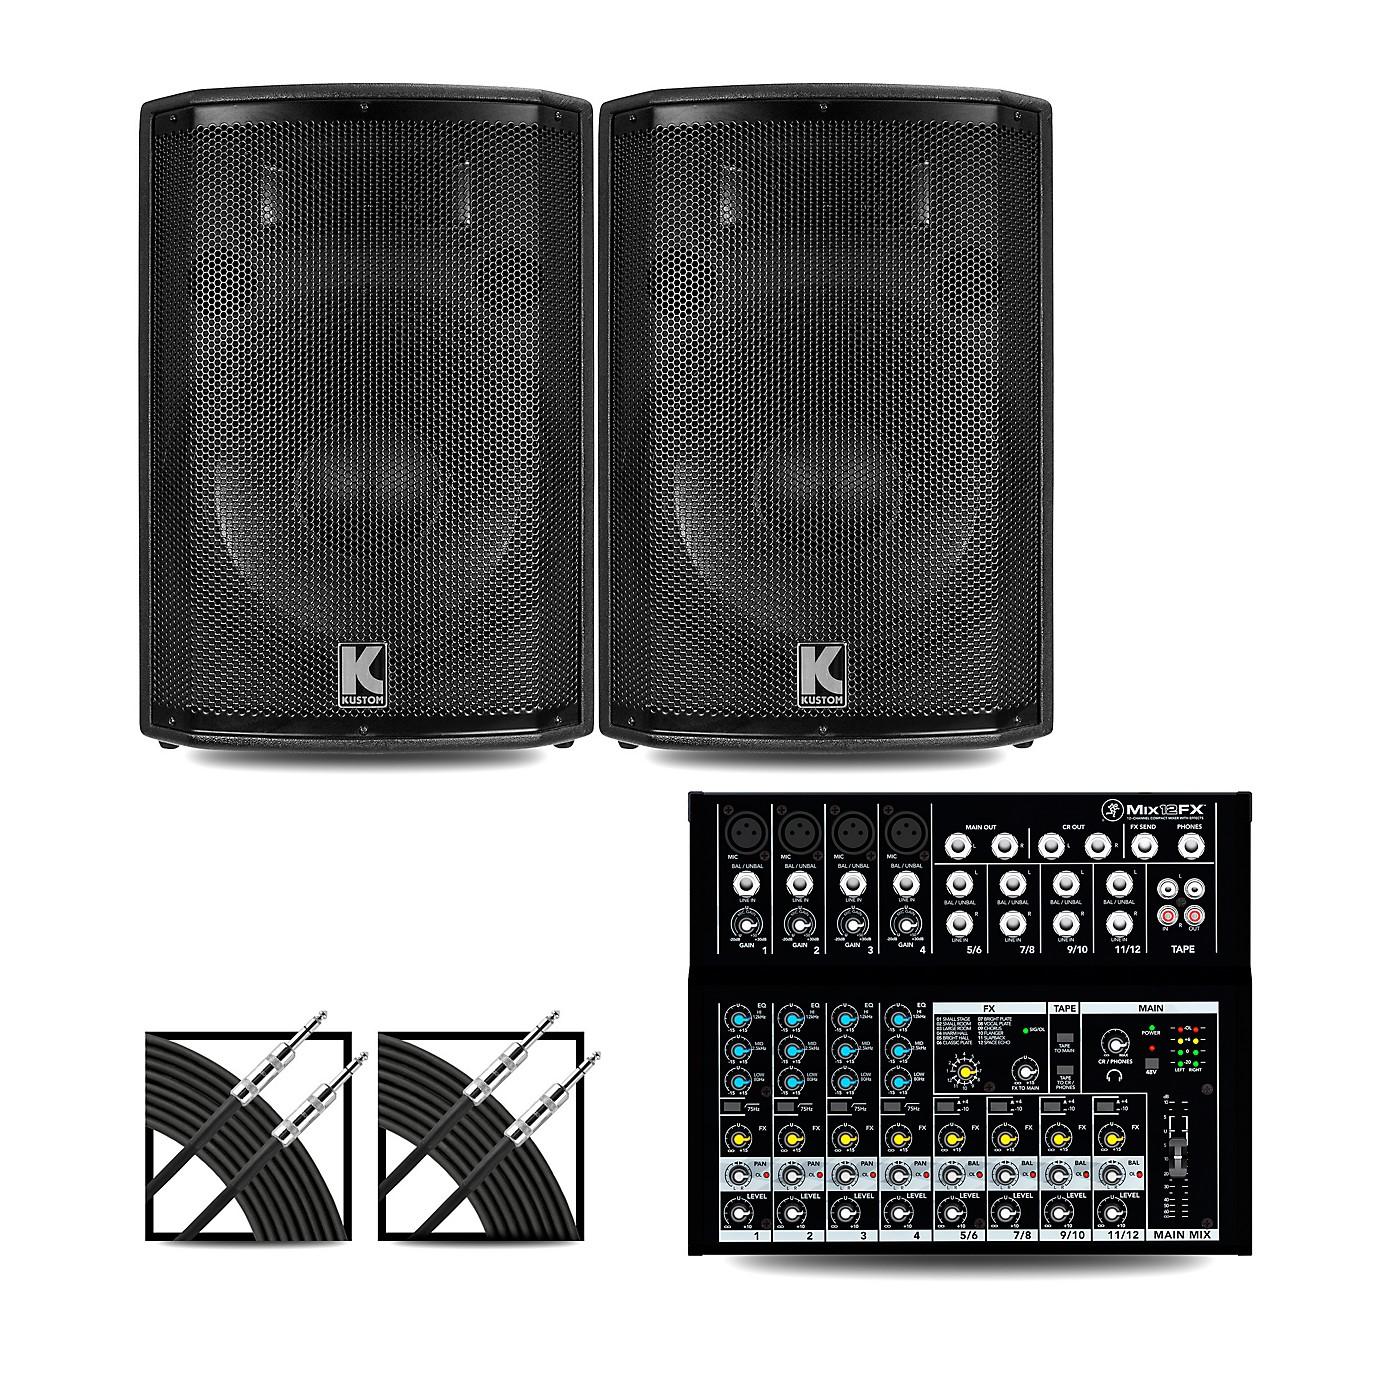 Mackie Mix12FX Mixer and Kustom HiPAC Speakers thumbnail